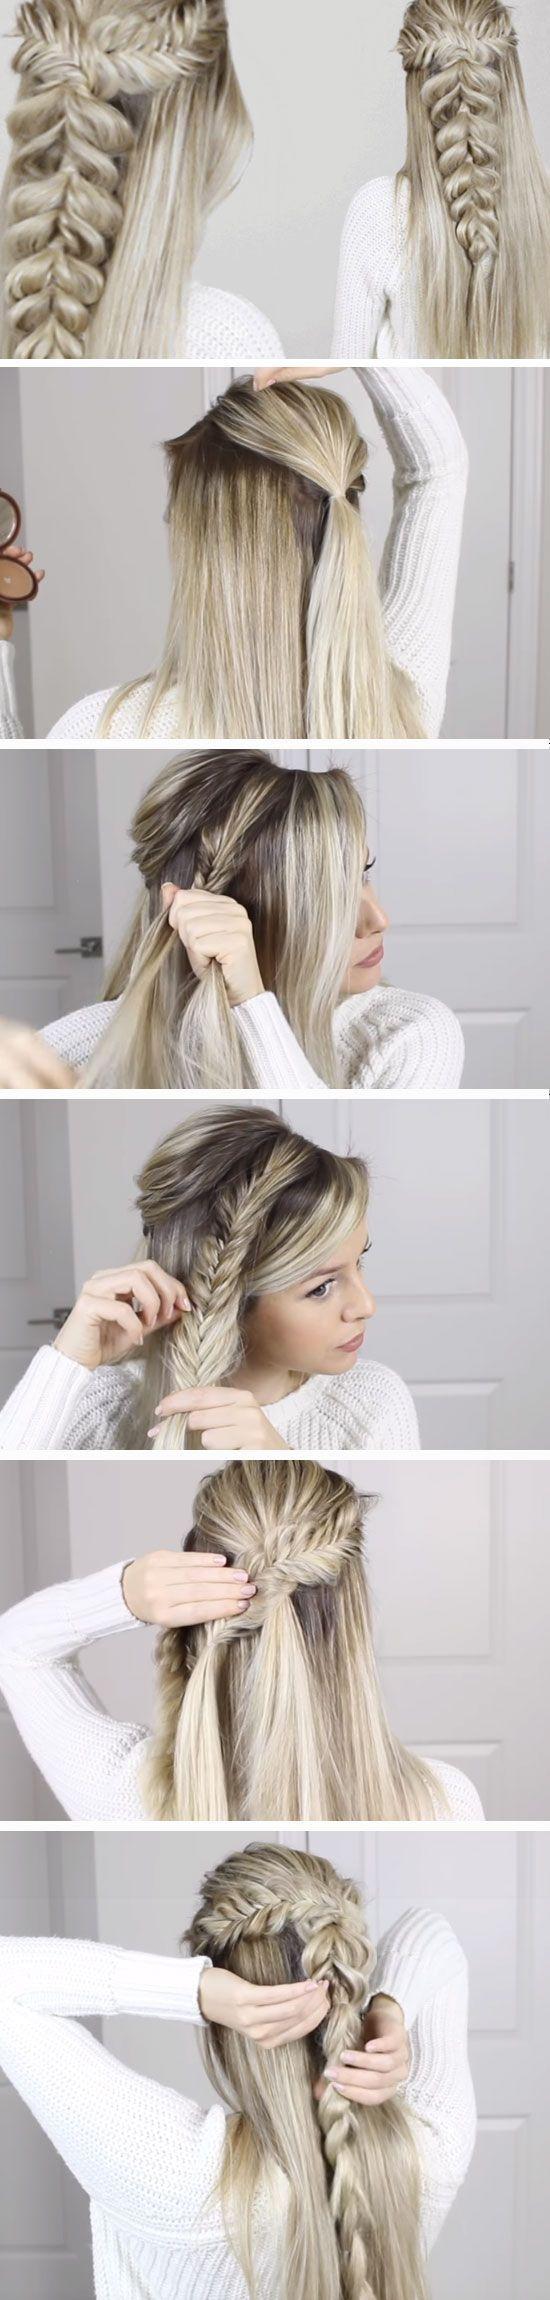 Easy DIY Wedding Hairstyles for Long Hair